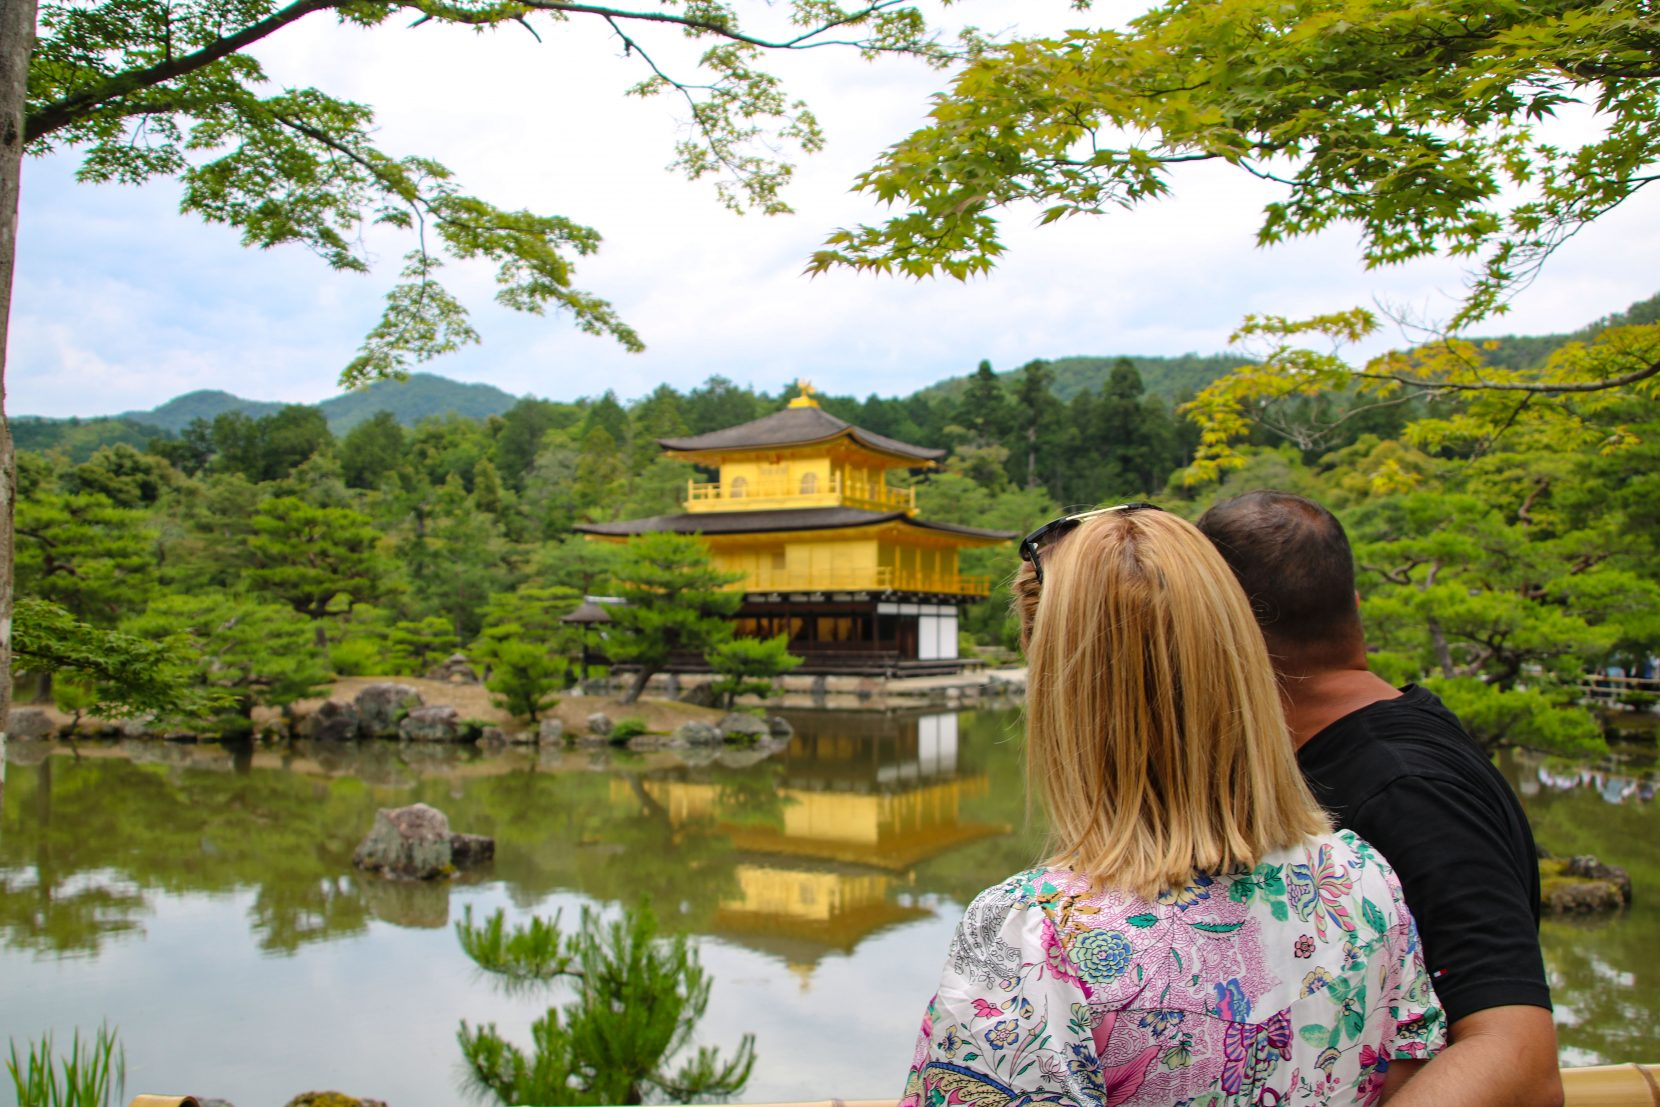 Pareja frente a un templo en Arashiyama